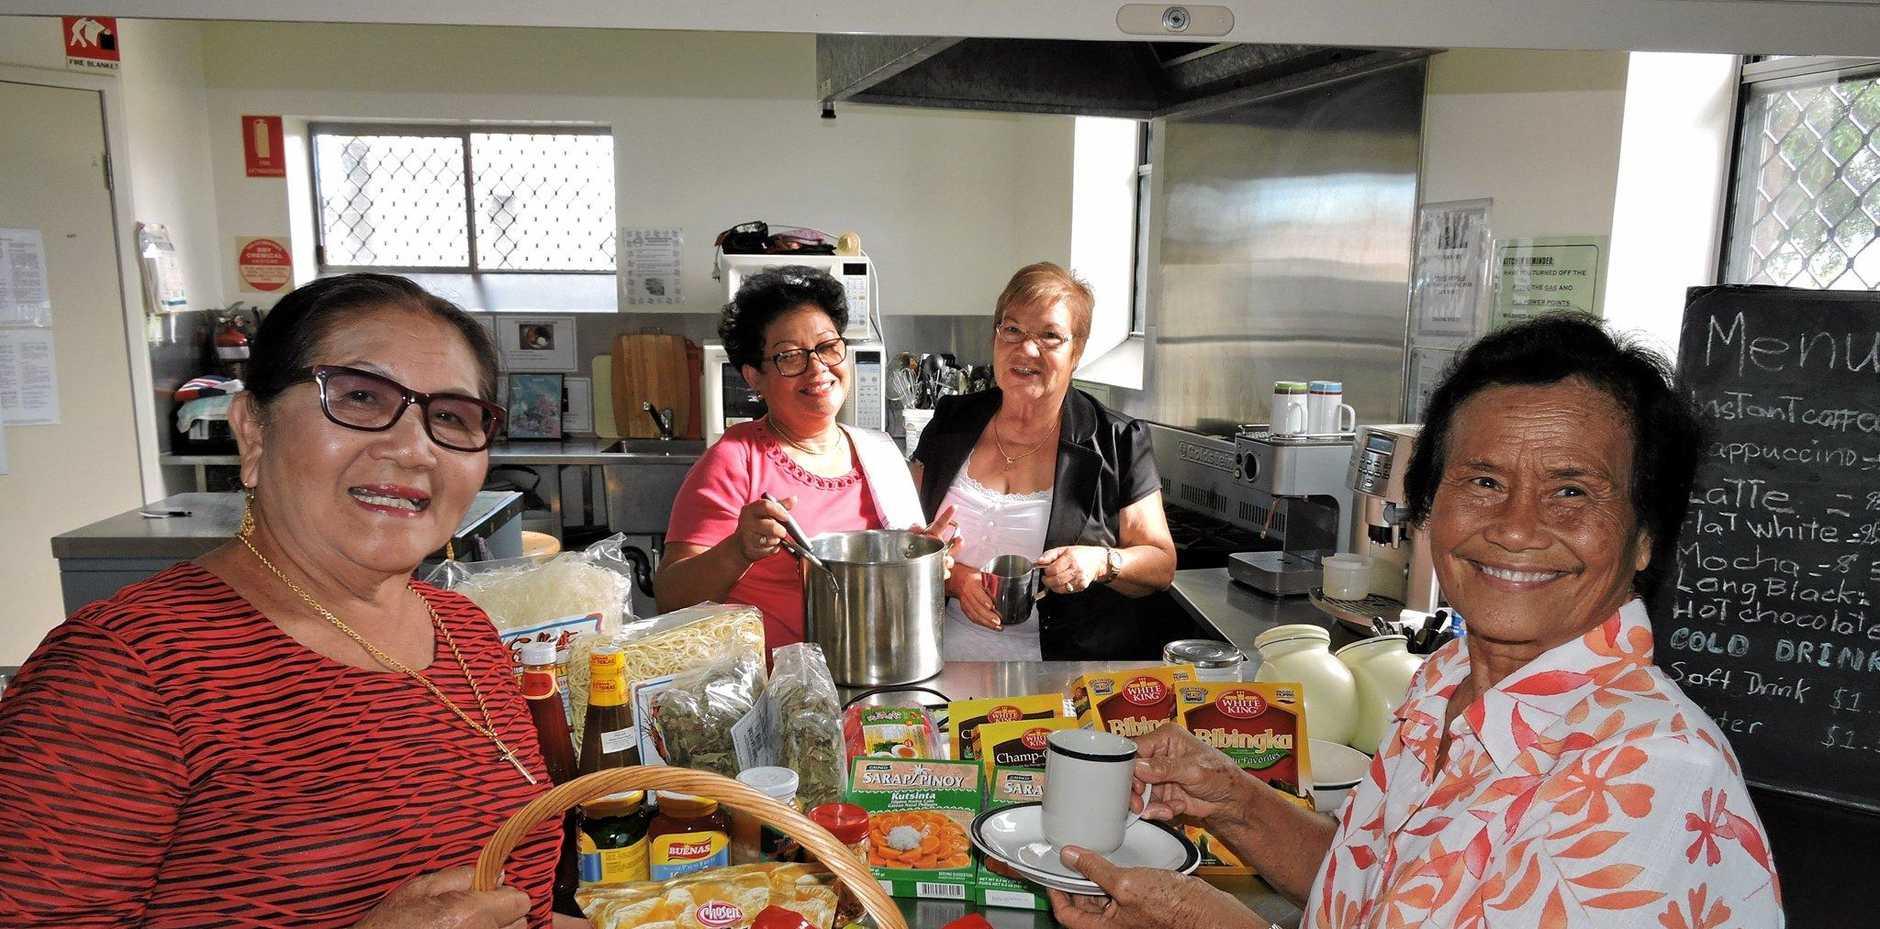 HELP WITH MOVE: Seniors Asian Women's Development Program members (from left) Fe Linortner, Julie Leck, Ramona Zanger and Rory Proctor   at   Maryborough Neighbourhood Centre.